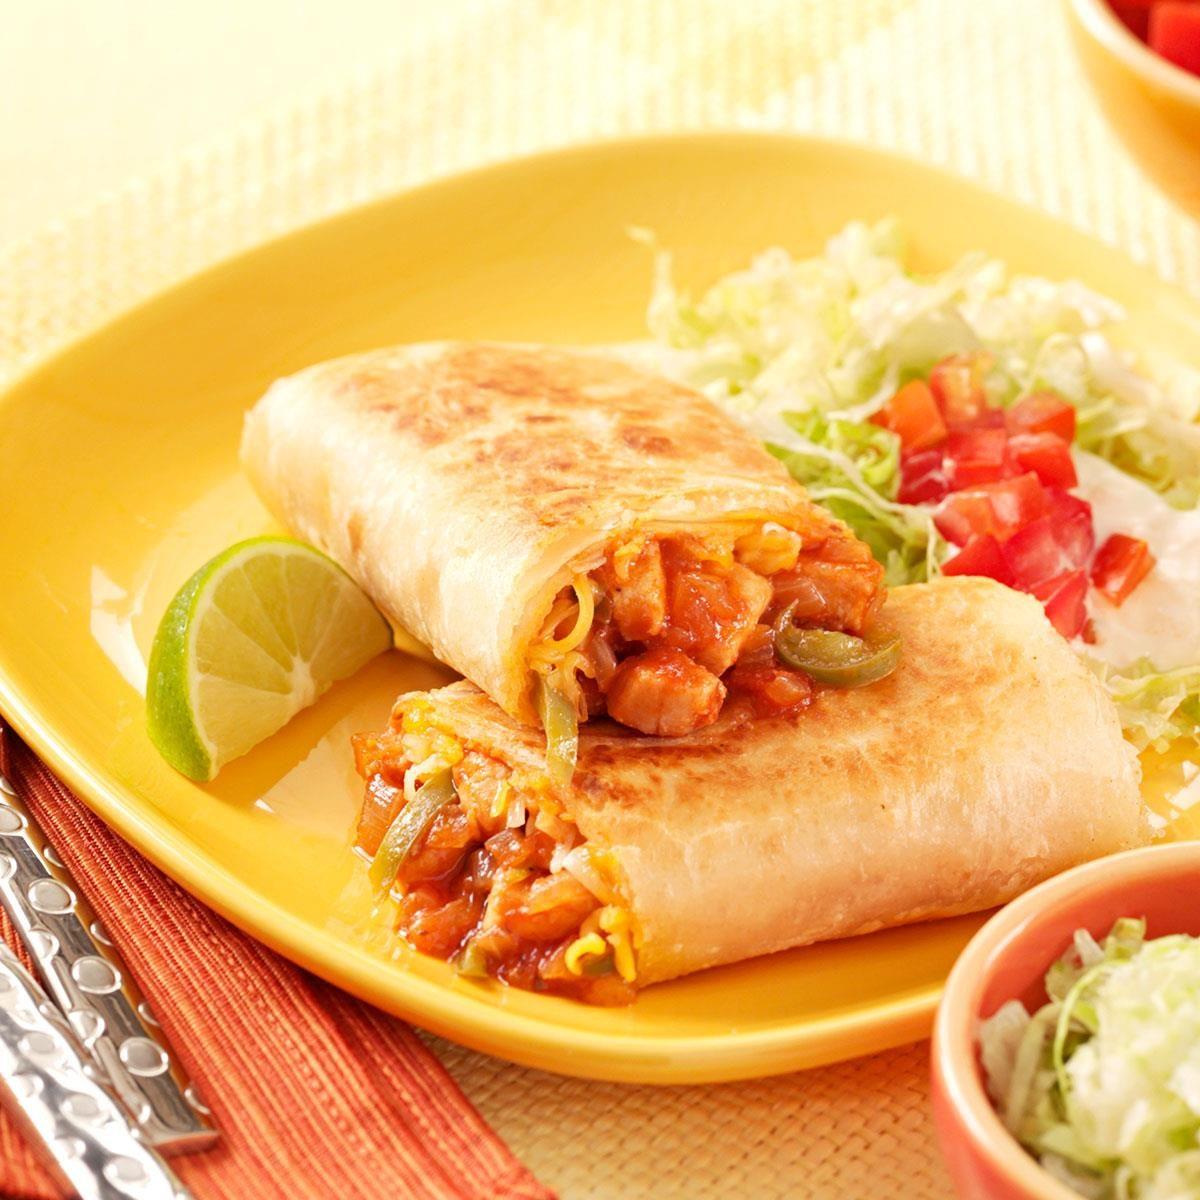 Barbecue Chicken Burritos Recipe Taste Of Home,Jamaican Beef Patties Recipe